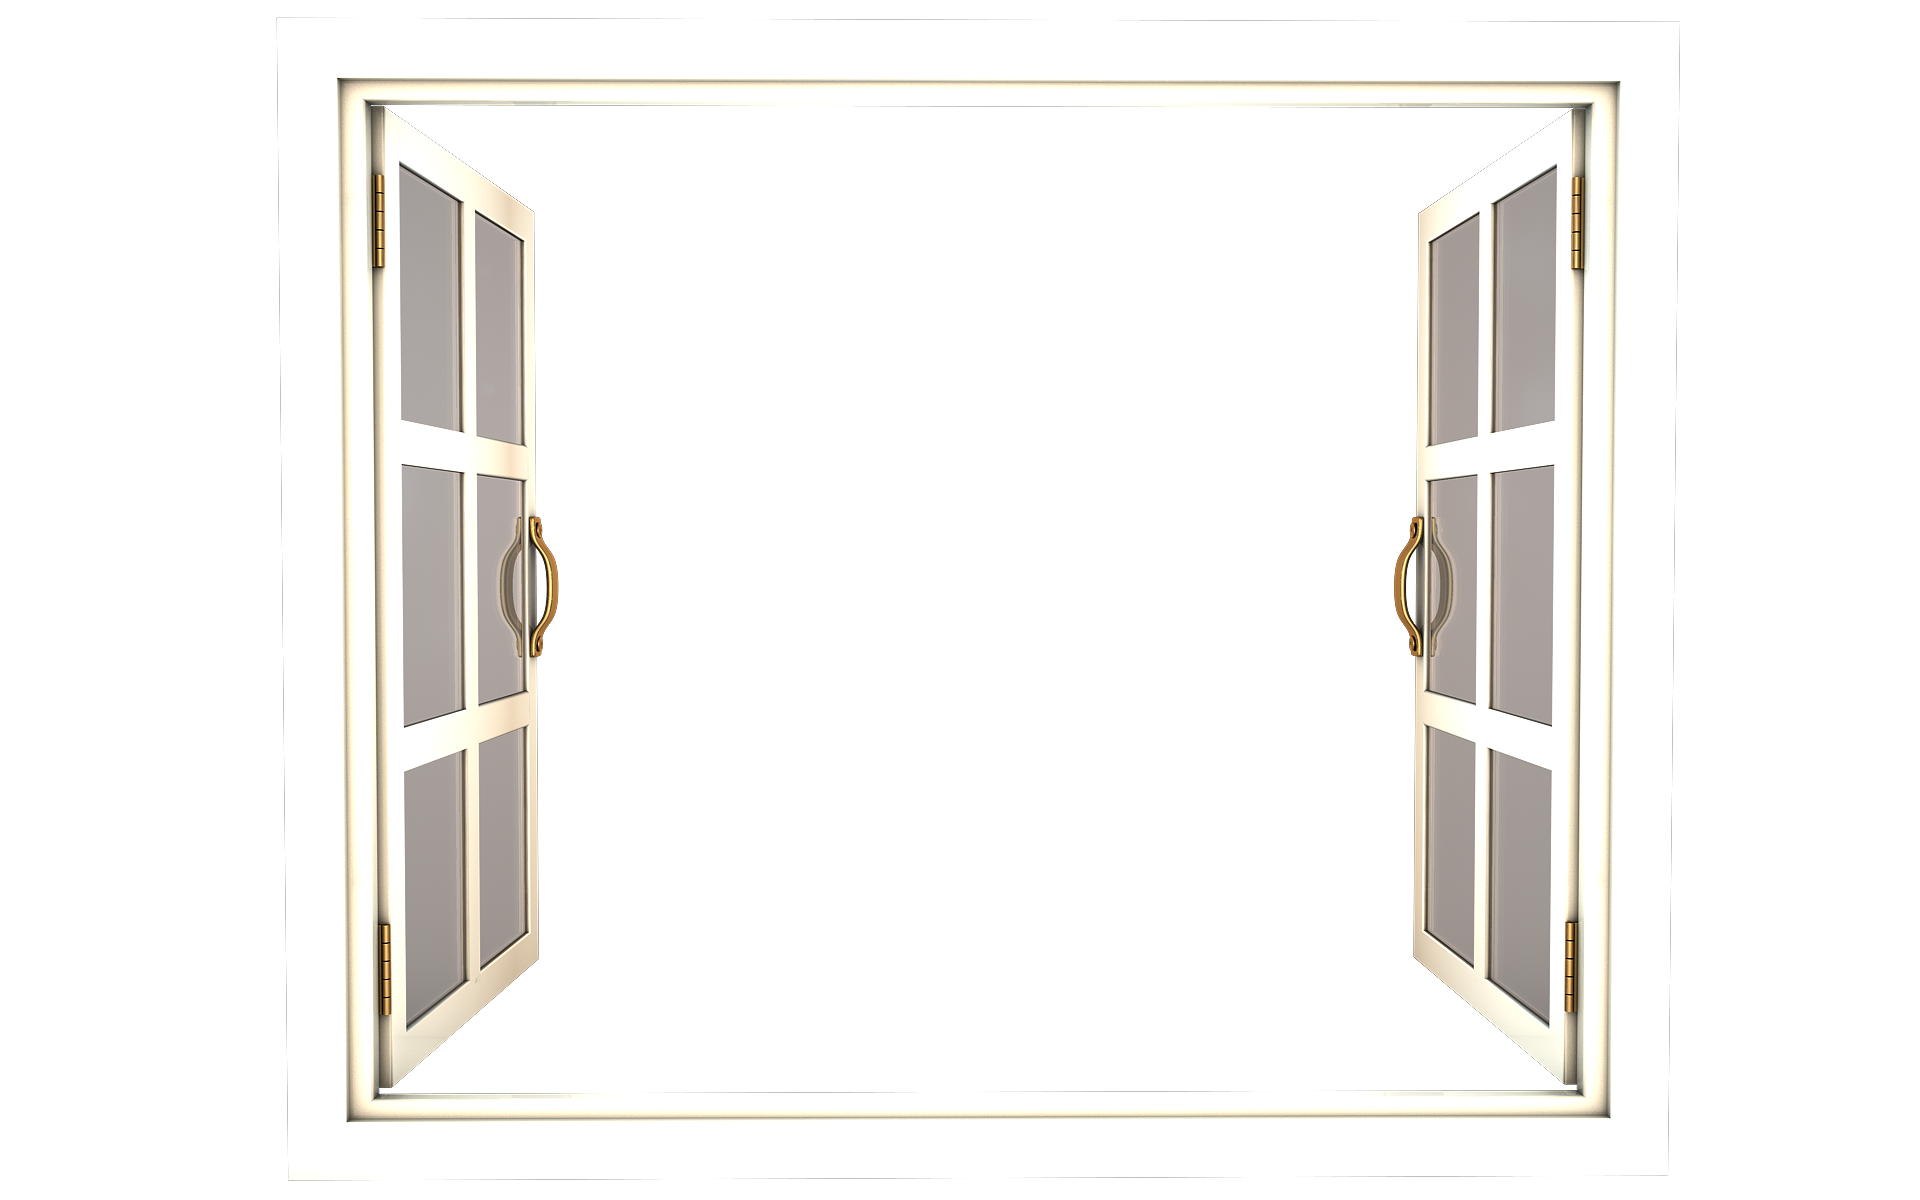 Window frame 2 by taz09 on deviantart for Window door images